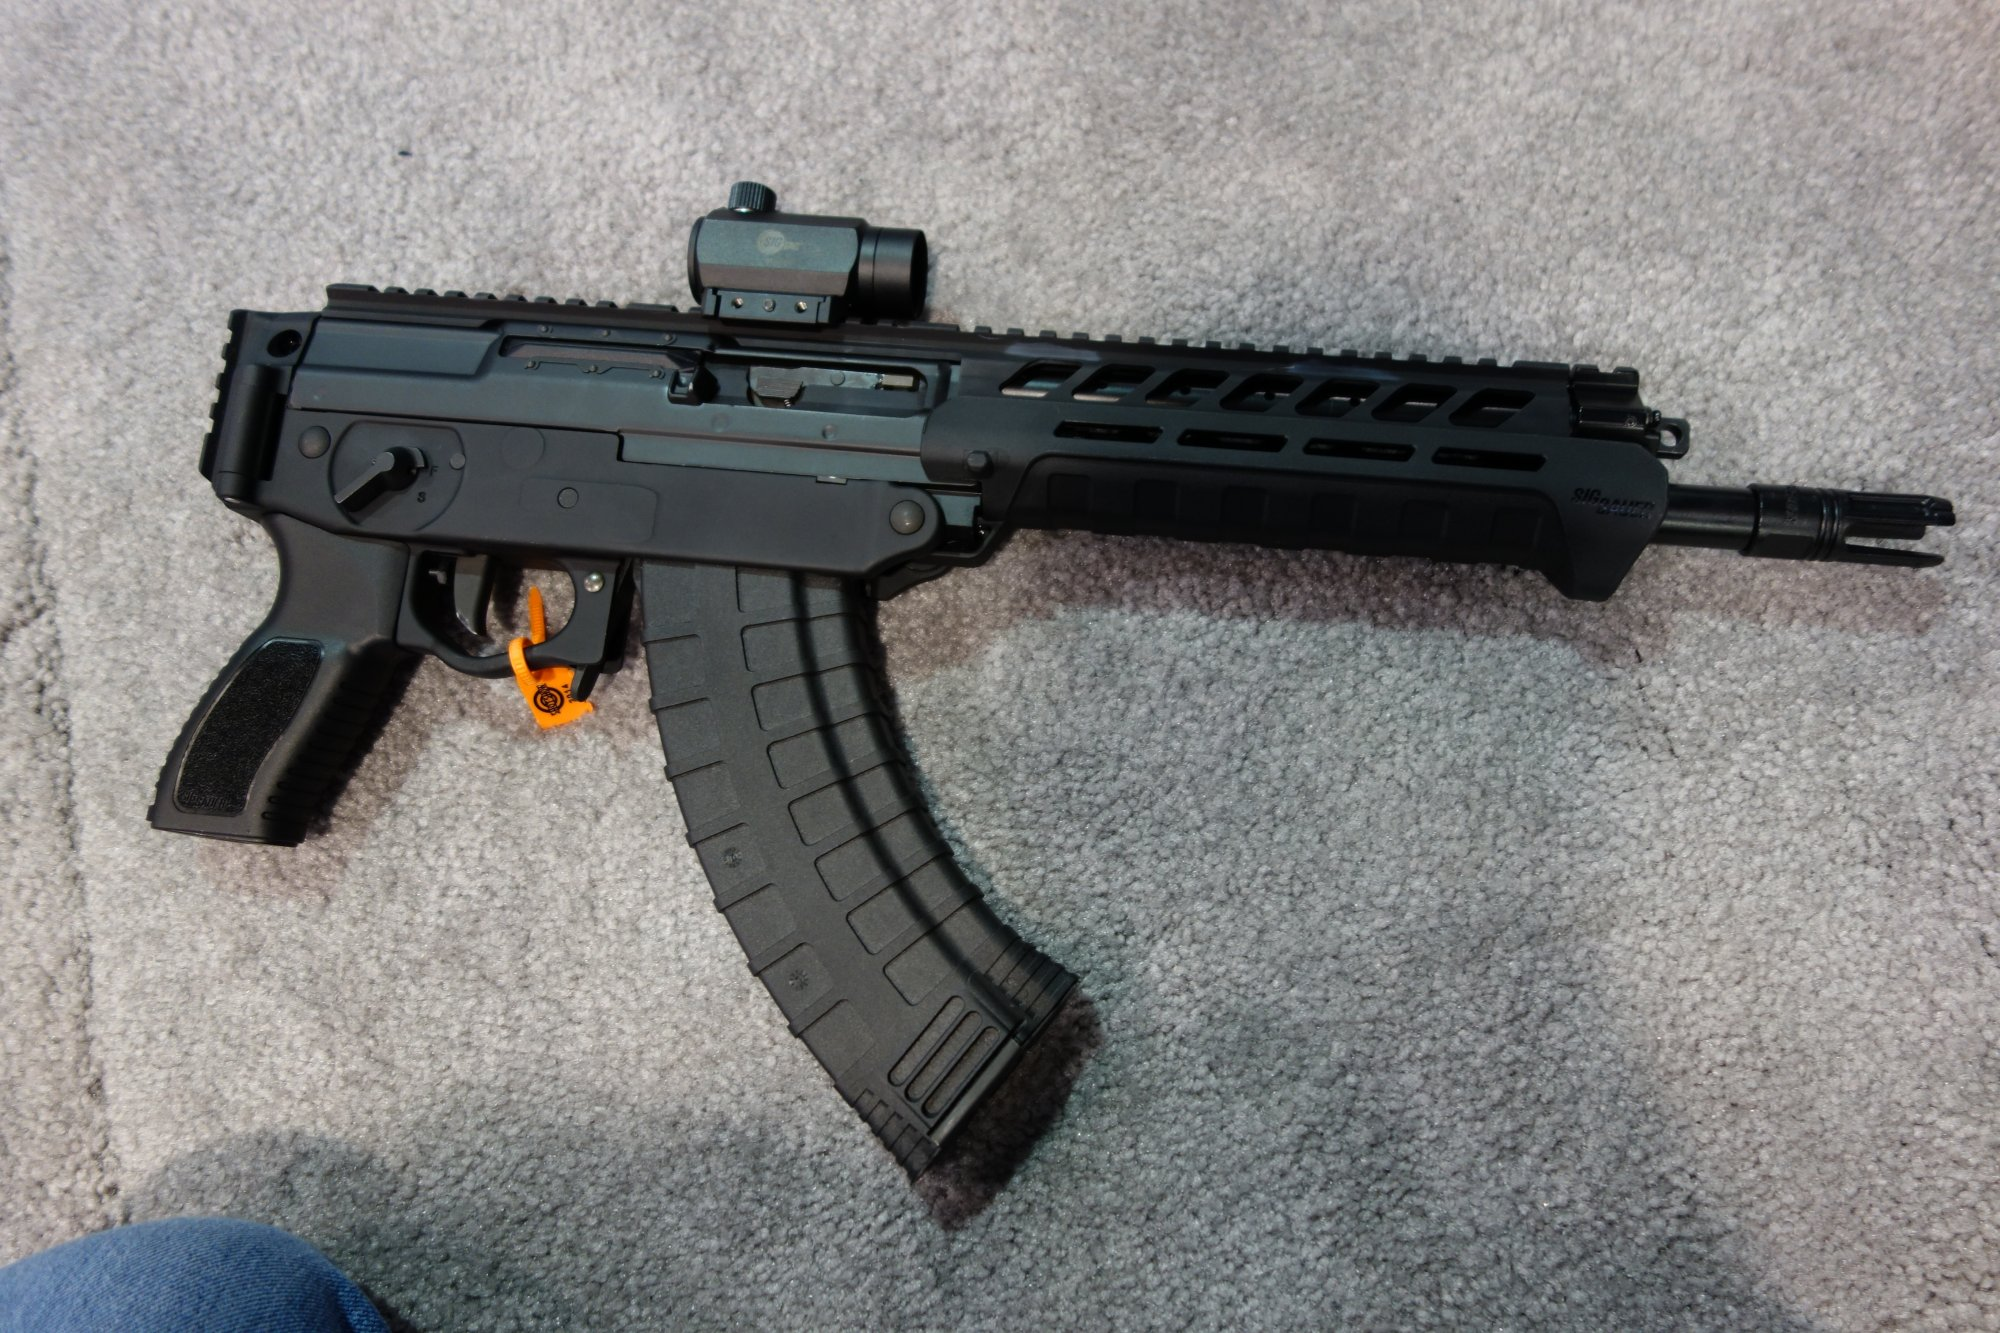 SIG SAUER SIG556xi 7.62x39mm Russian Configuration Semi Auto Only Modular Multi Caliber Combat Tactical Carbine Kalashnikov AK 47 AKM SHOT Show 2014 1 15 14 David Crane DefenseReview.com DR 7 SIG SAUER SIG556xi Modular, Multi Caliber (5.56mm NATO, 300 AAC Blackout/300BLK, 7.62x39mm Russian) Gas Piston/Op Rod Combat/Tactical Rifle/Carbine/SBR with Kalashnikov AK 47/AKM Configuration Capability!